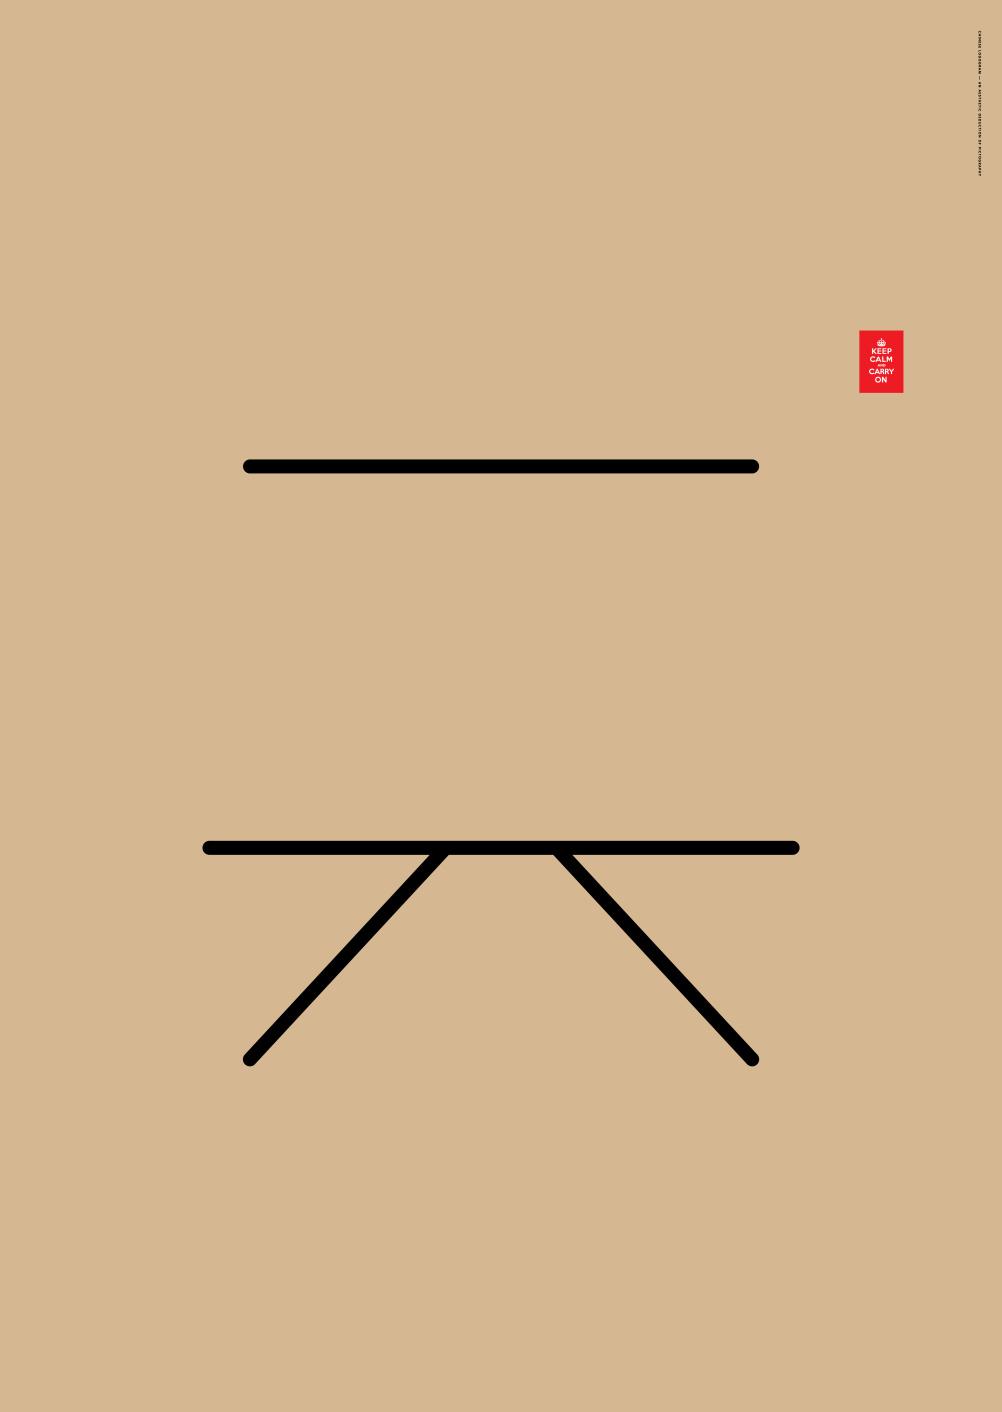 Jonathan Yuen, Asian Subconscious